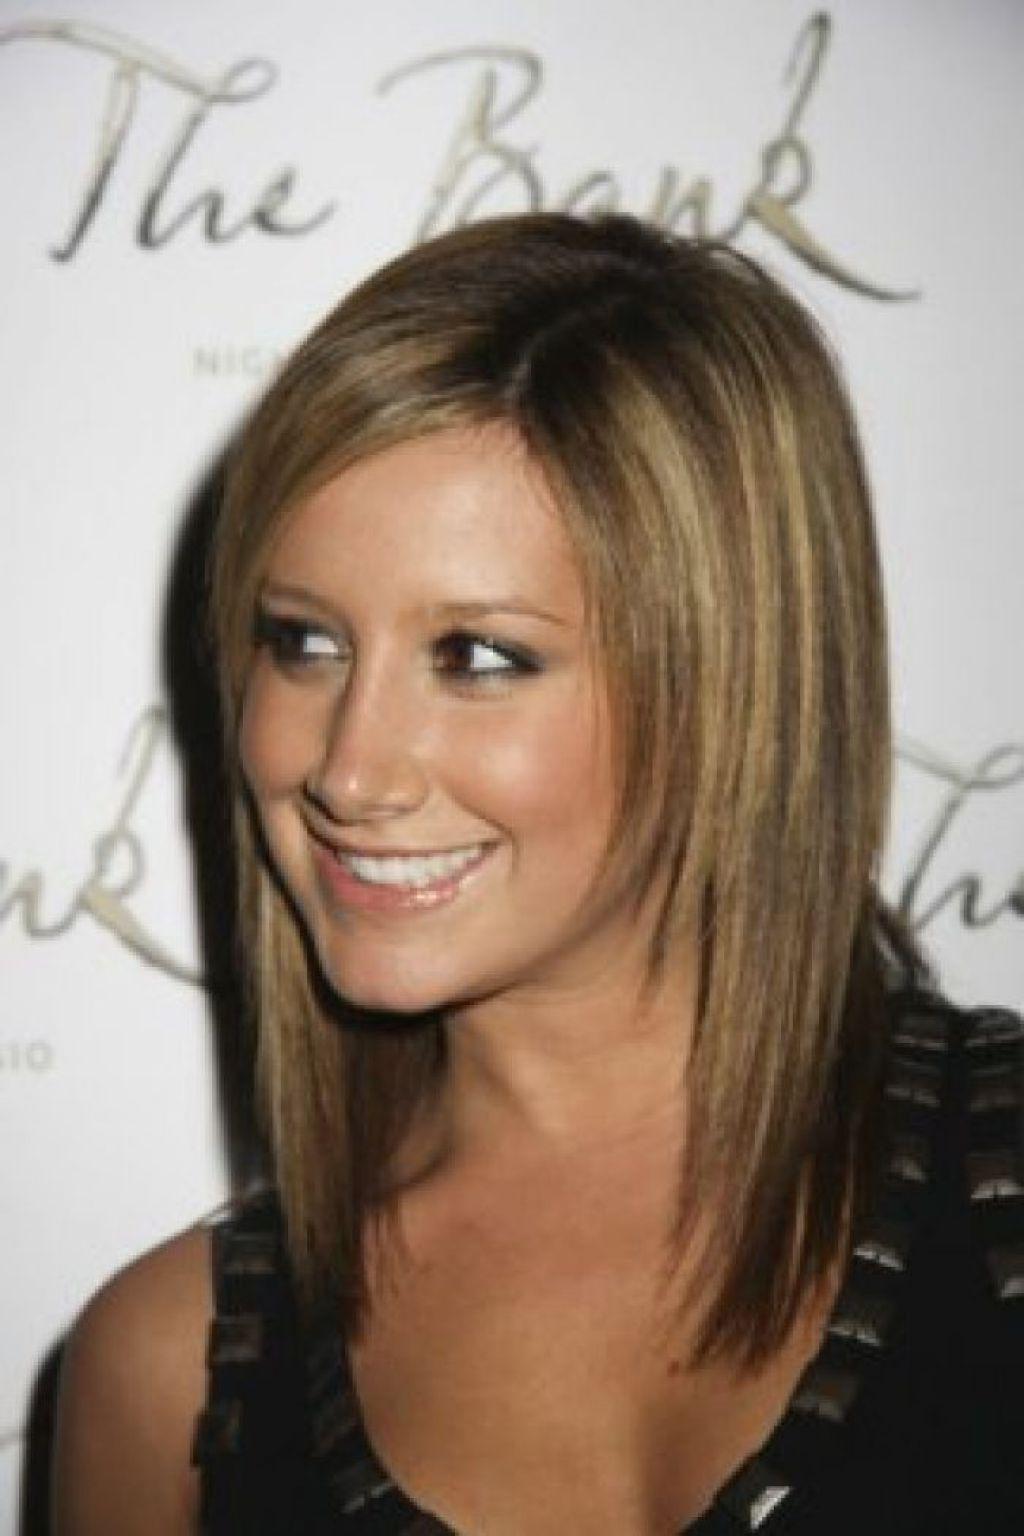 Medium Length Thin Hair – Hairstyle For Women & Man Regarding Well Known Medium Medium Hairstyles For Thin Hair (View 12 of 20)